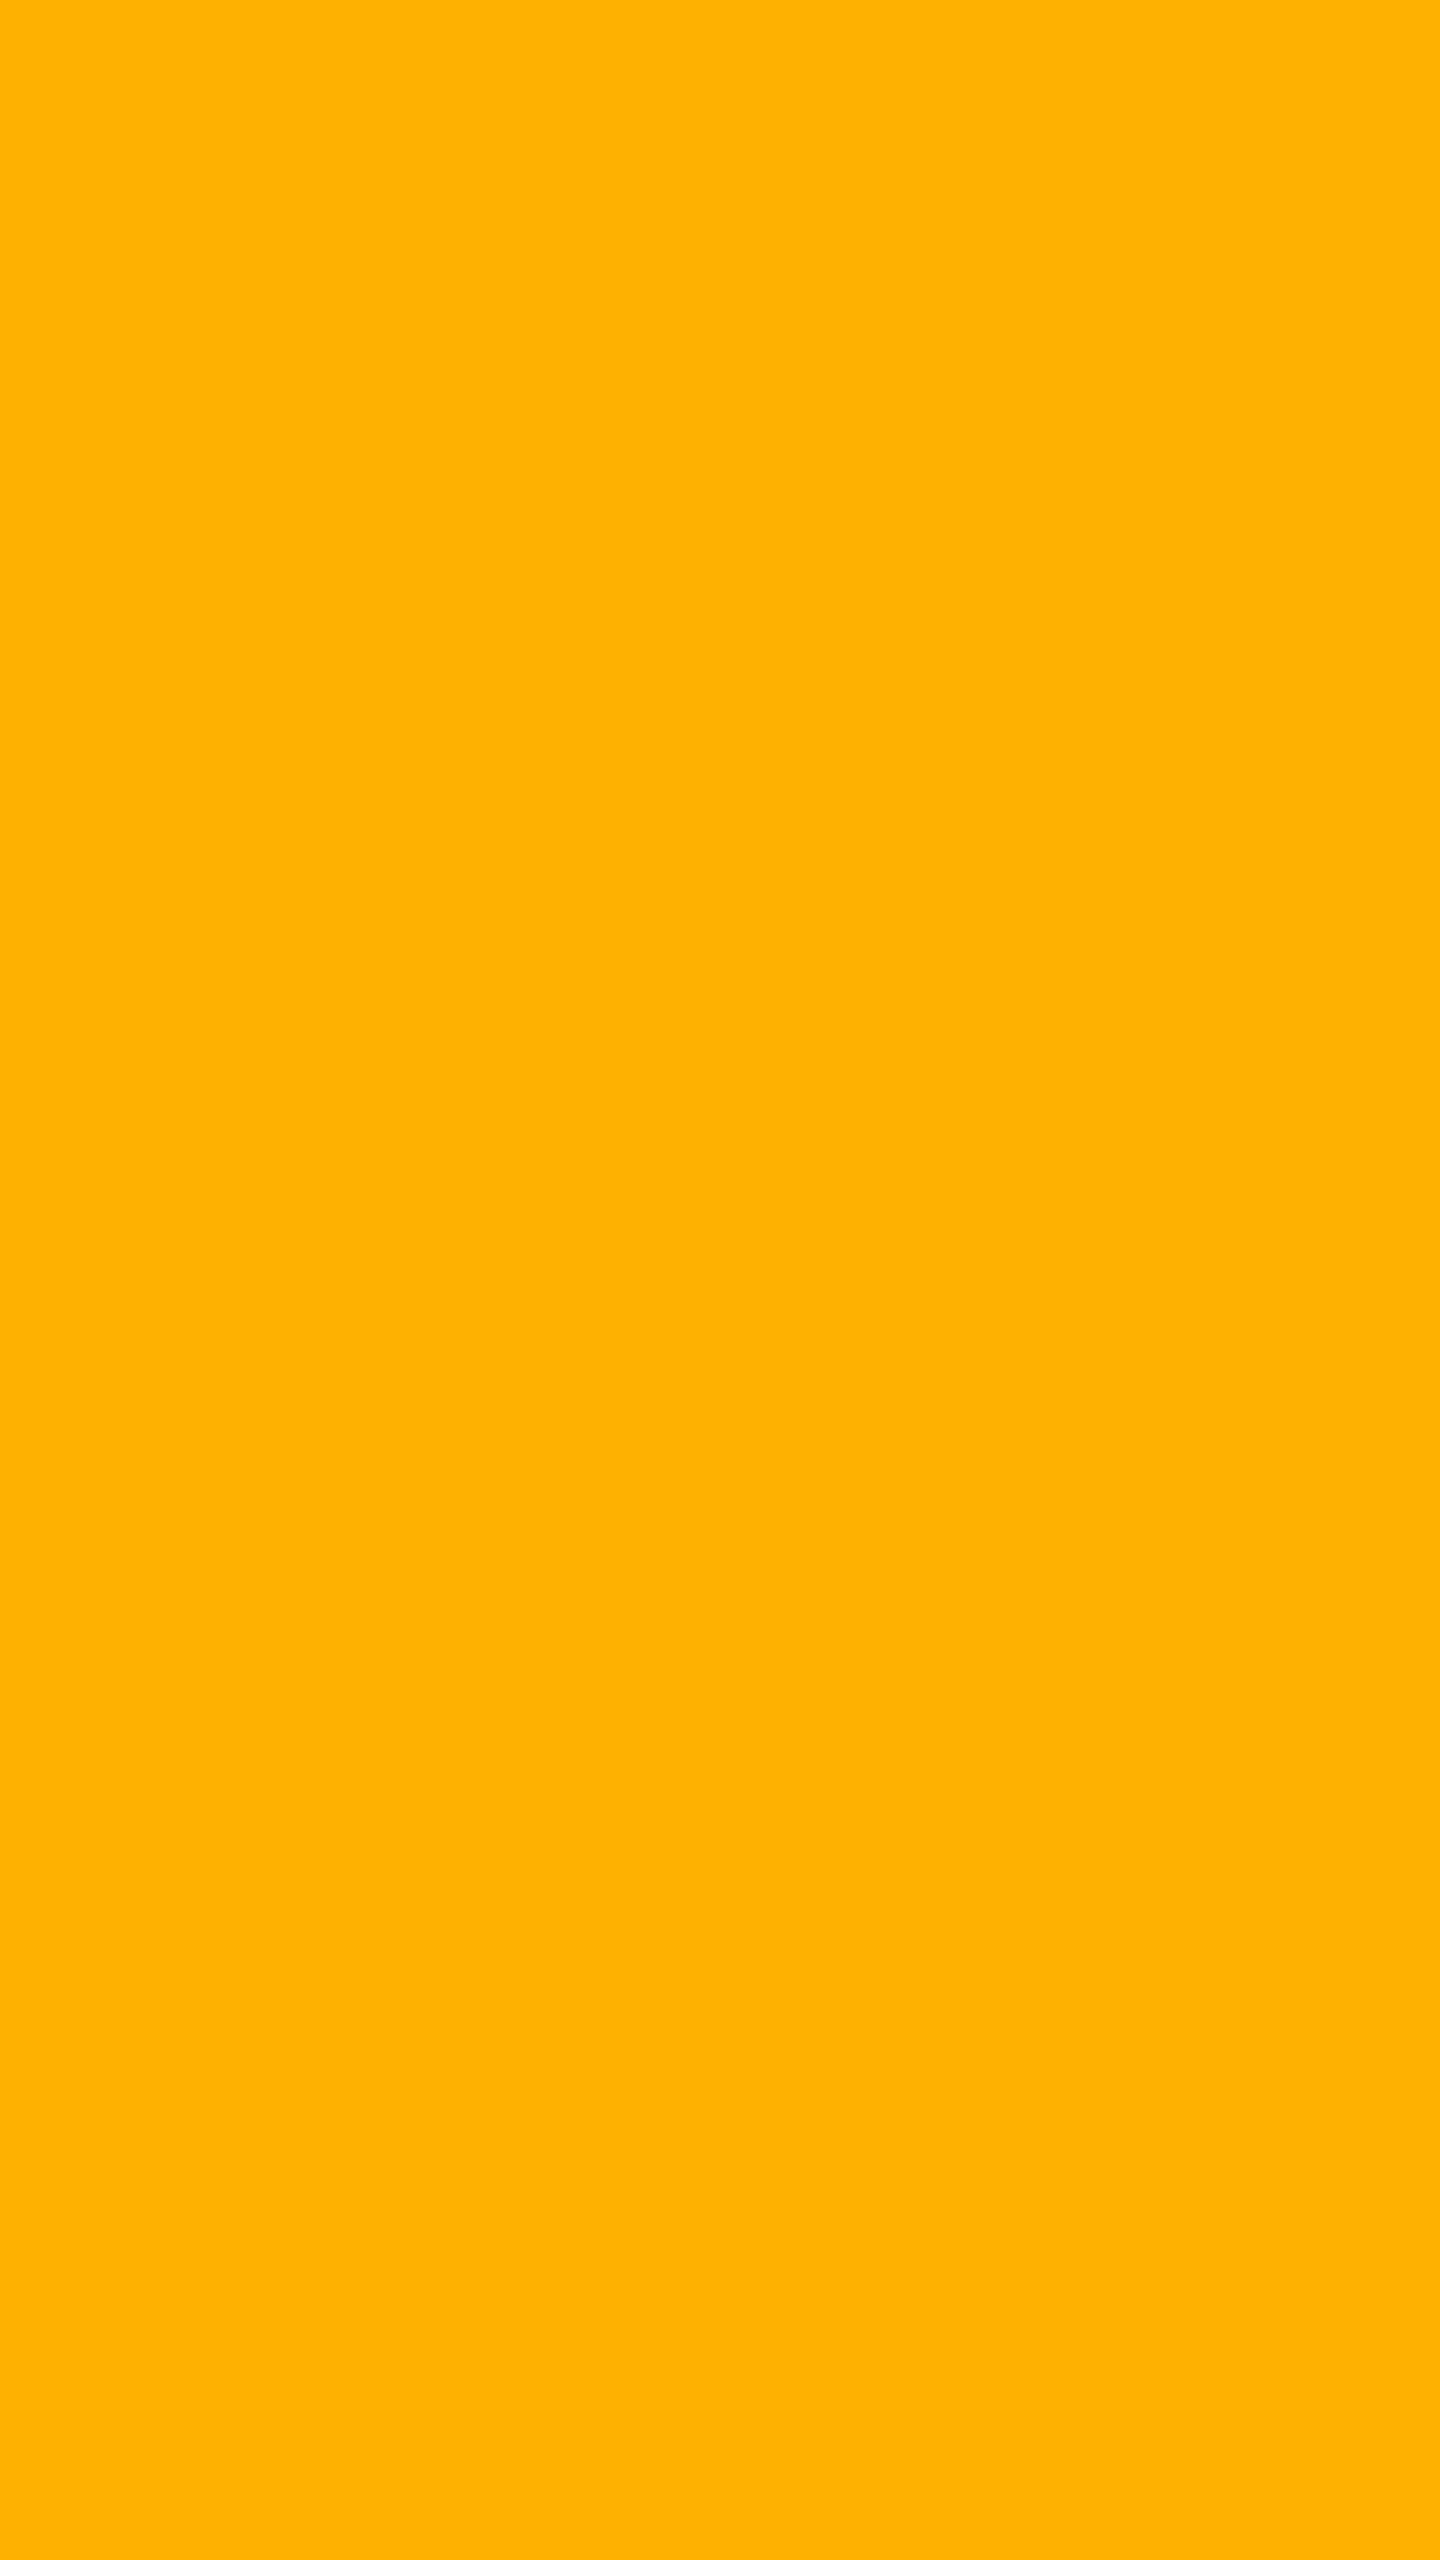 Yellow background Galaxy S6 Wallpaper